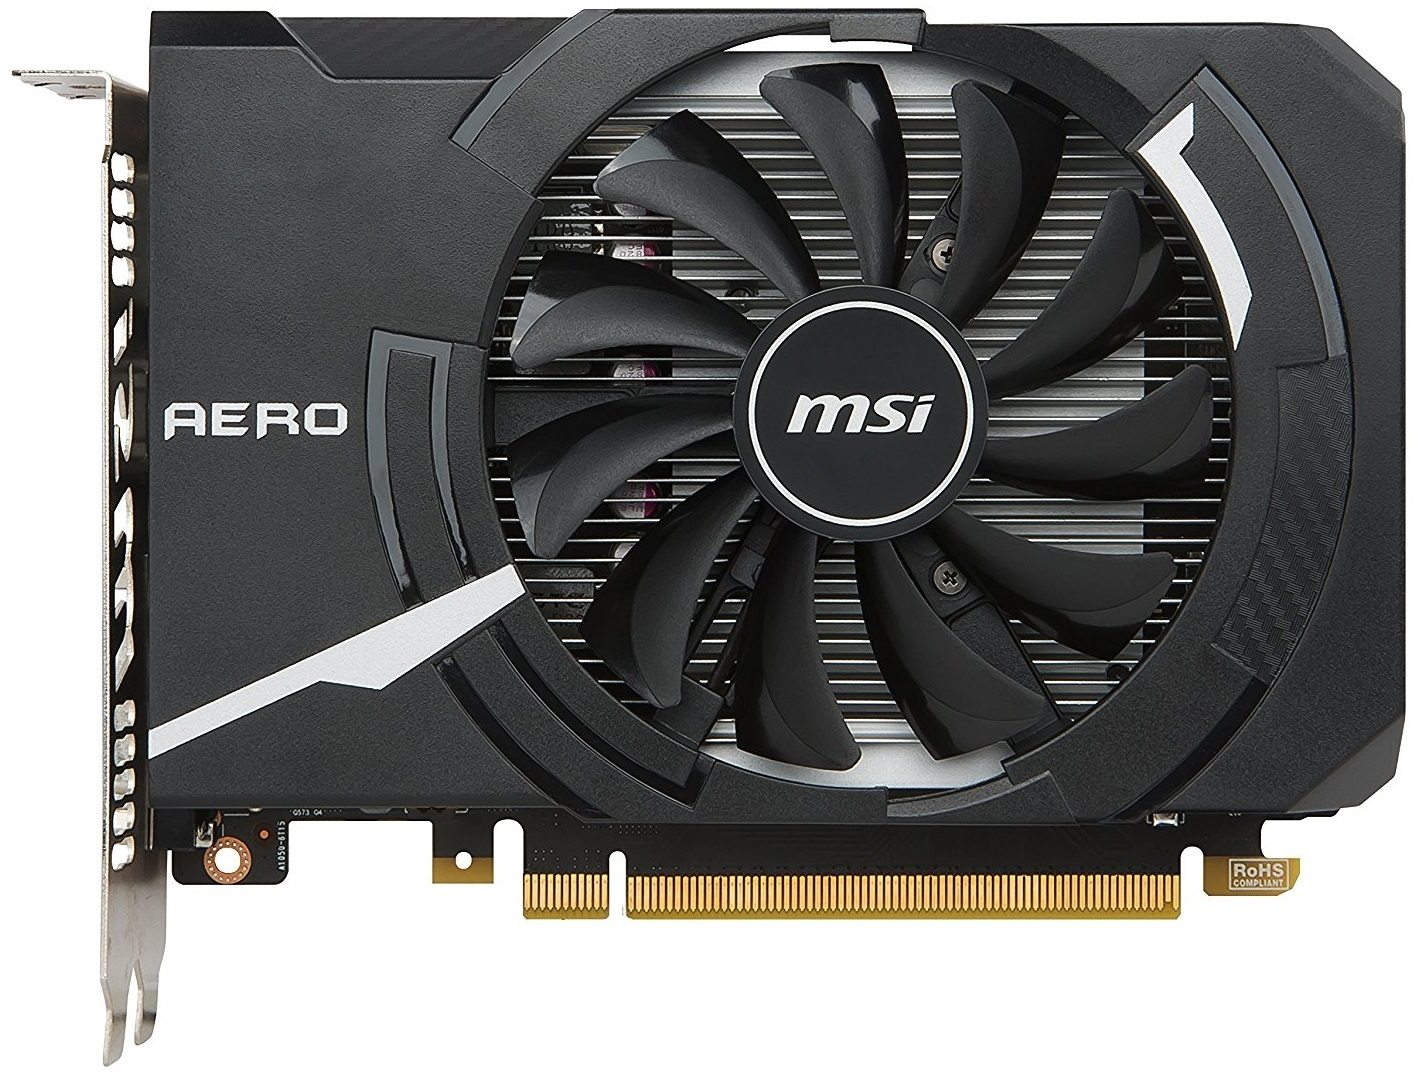 MSI GeForce GTX 1050 Aero 2GB OC V1 Graphics Card image